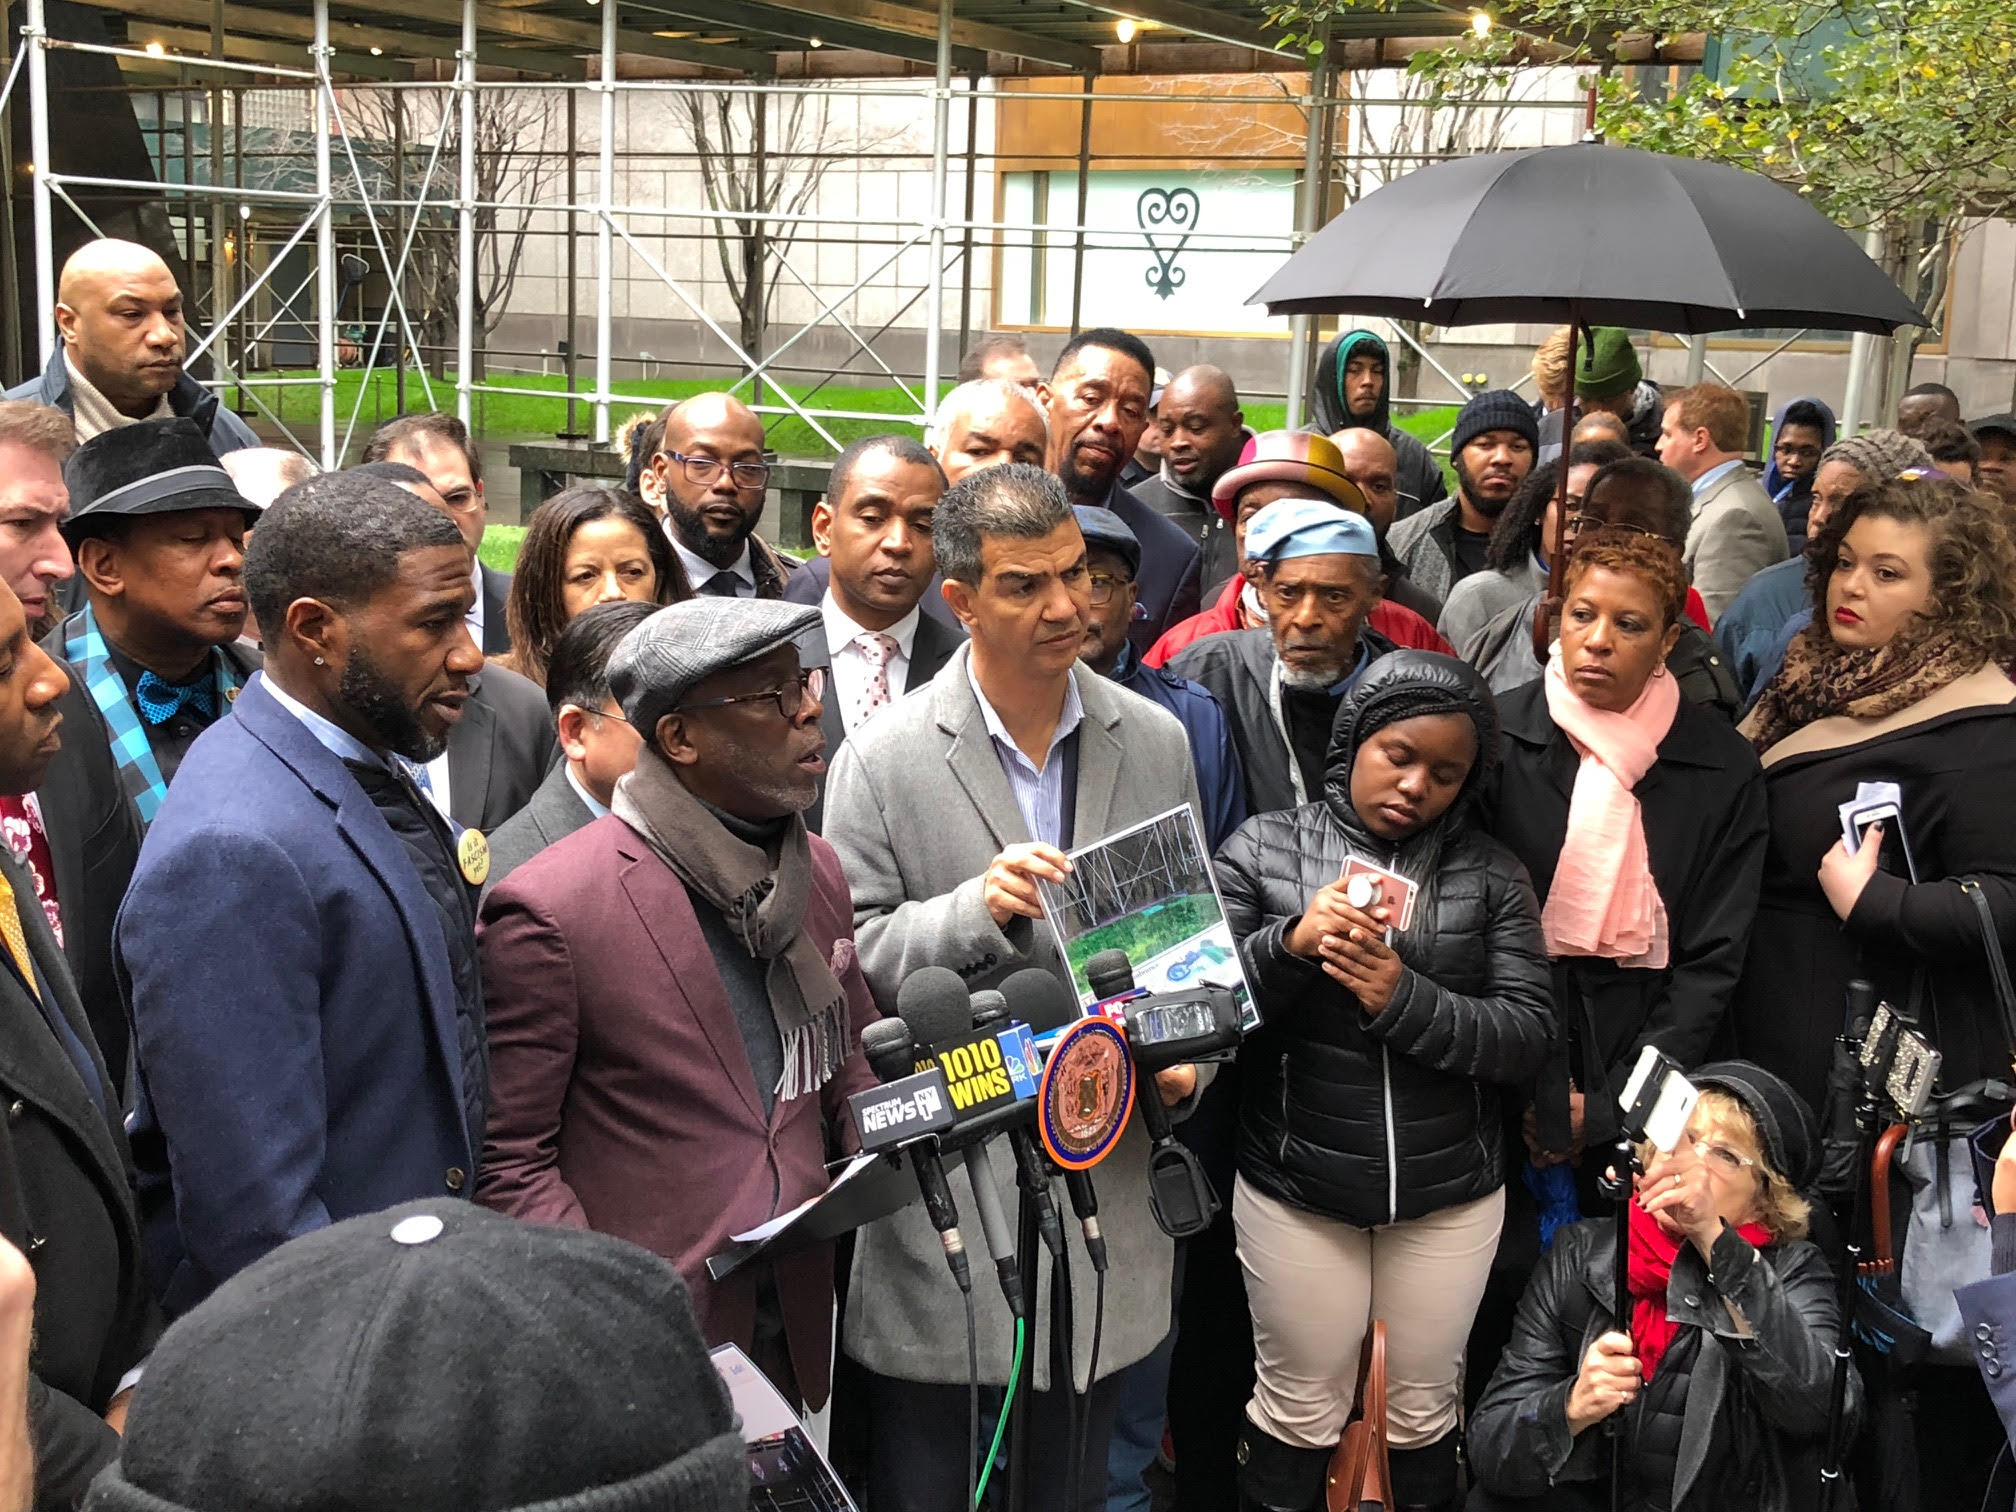 Councilmembers Jumaane Williams (left) I. Daneek Miller (center) and Ydanis Rodriguez (right) condemn racist vandalism at the African Burial Ground Monument in Lower Manhattan. Photo courtesy of I. Daneek Miller.